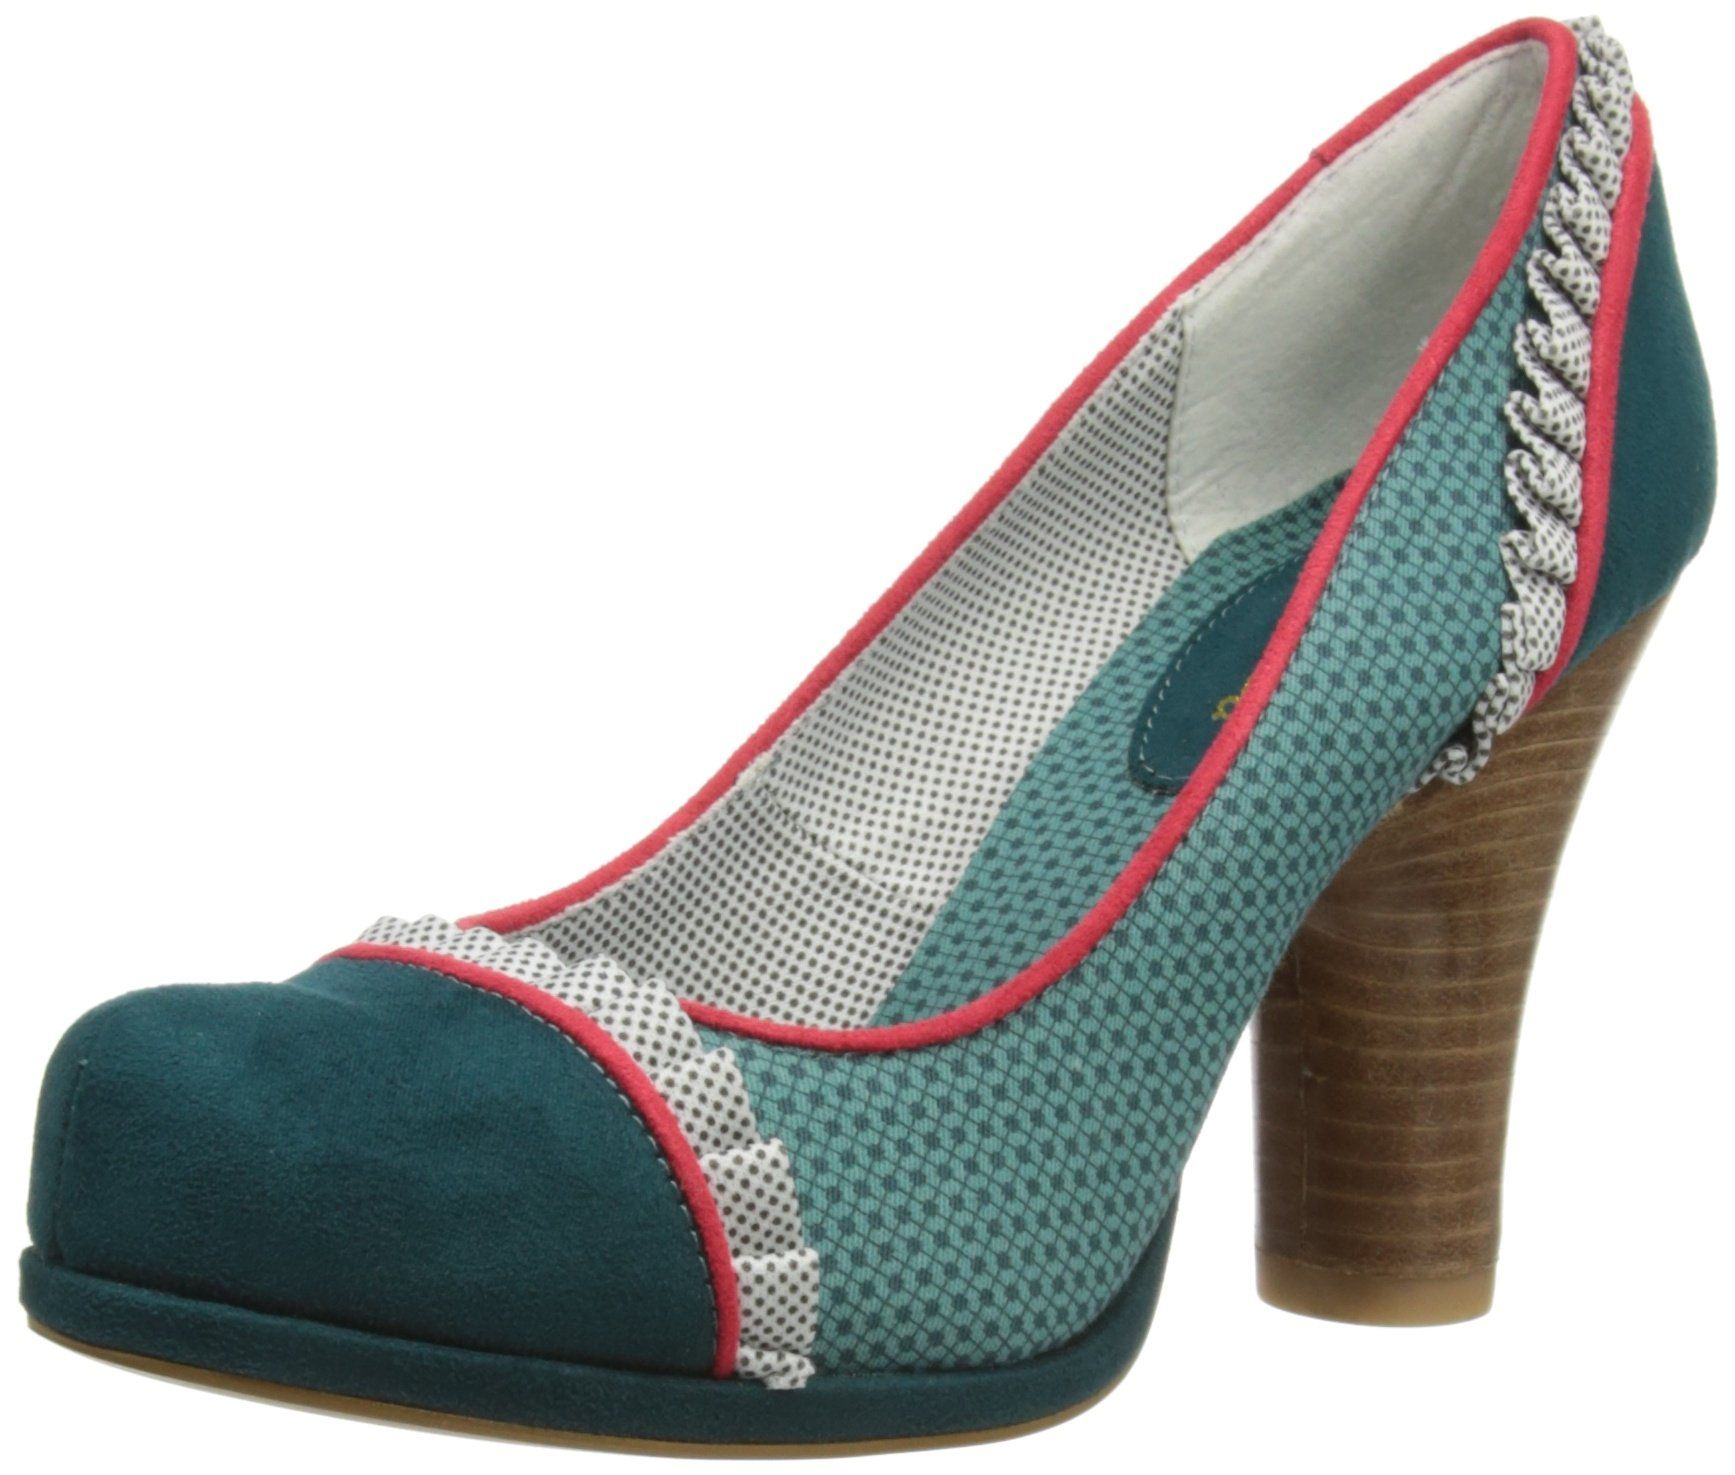 Ruby Shoo Womens Drew Court Shoes 08542 Teal 5 UK ddd234e747ff